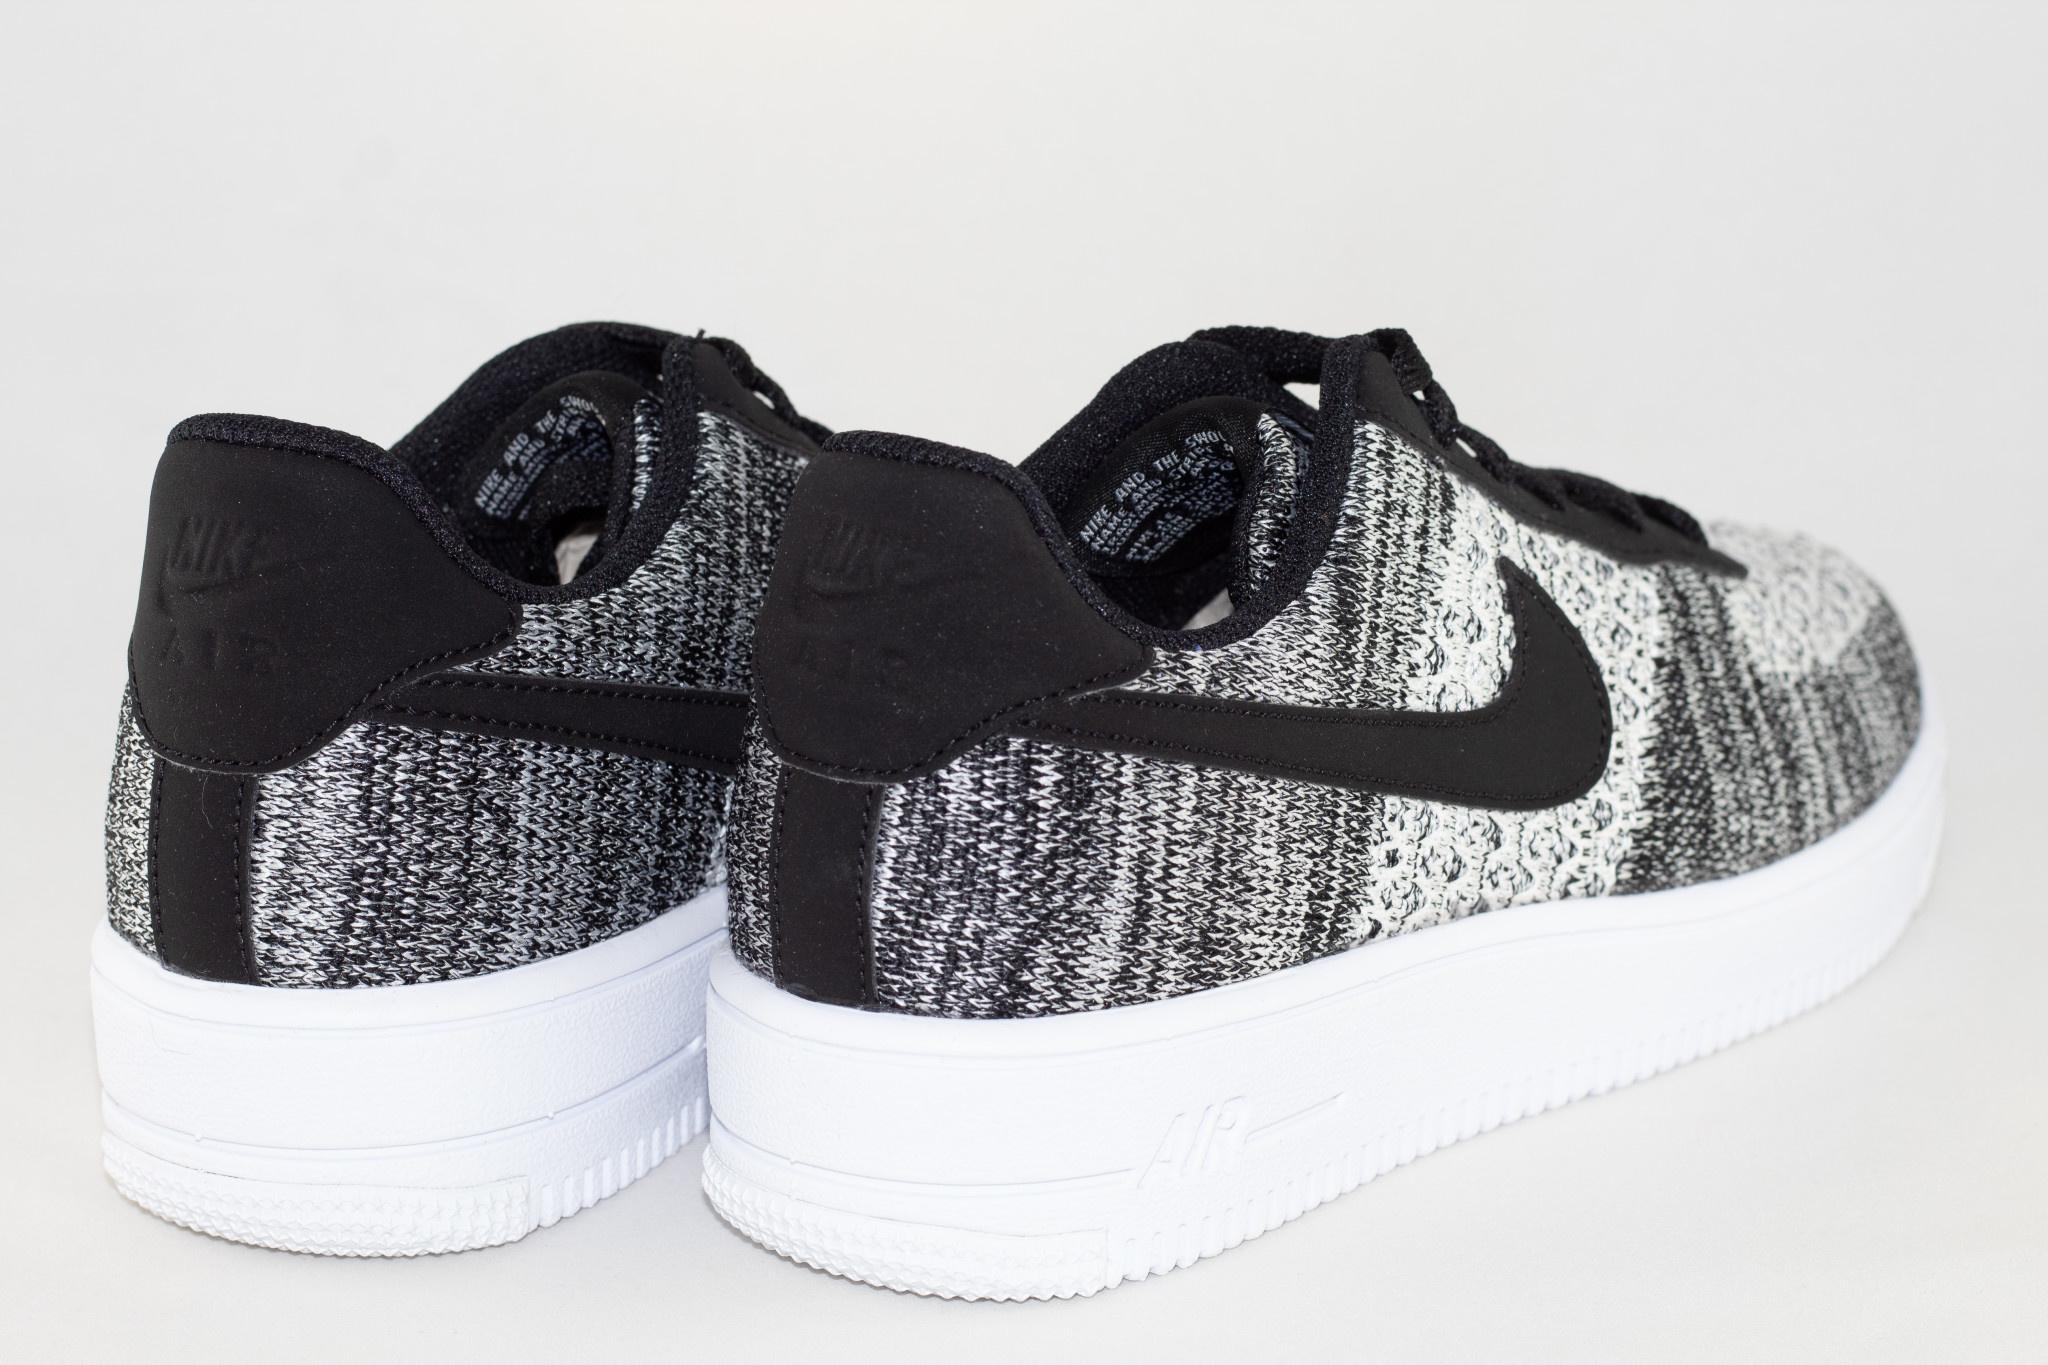 Nike J NIKE AIR FORCE 1 FLYKNIT 2.0 (gs) Black/ Pure Platinium- White